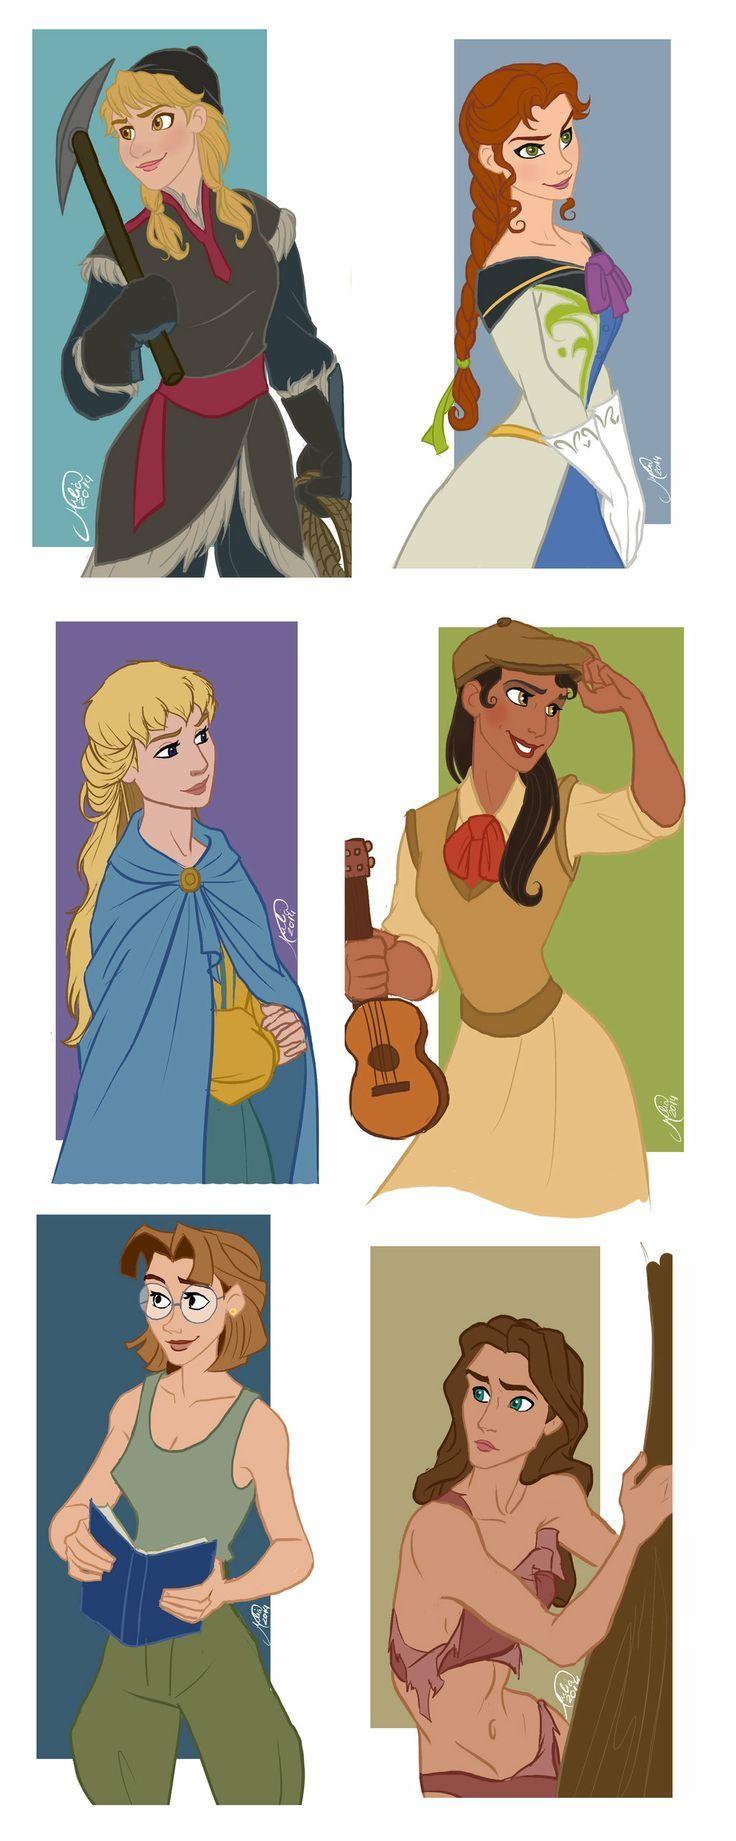 Male Gender Bender - Disney Characters | Disney Art ...  Male Gender Ben...